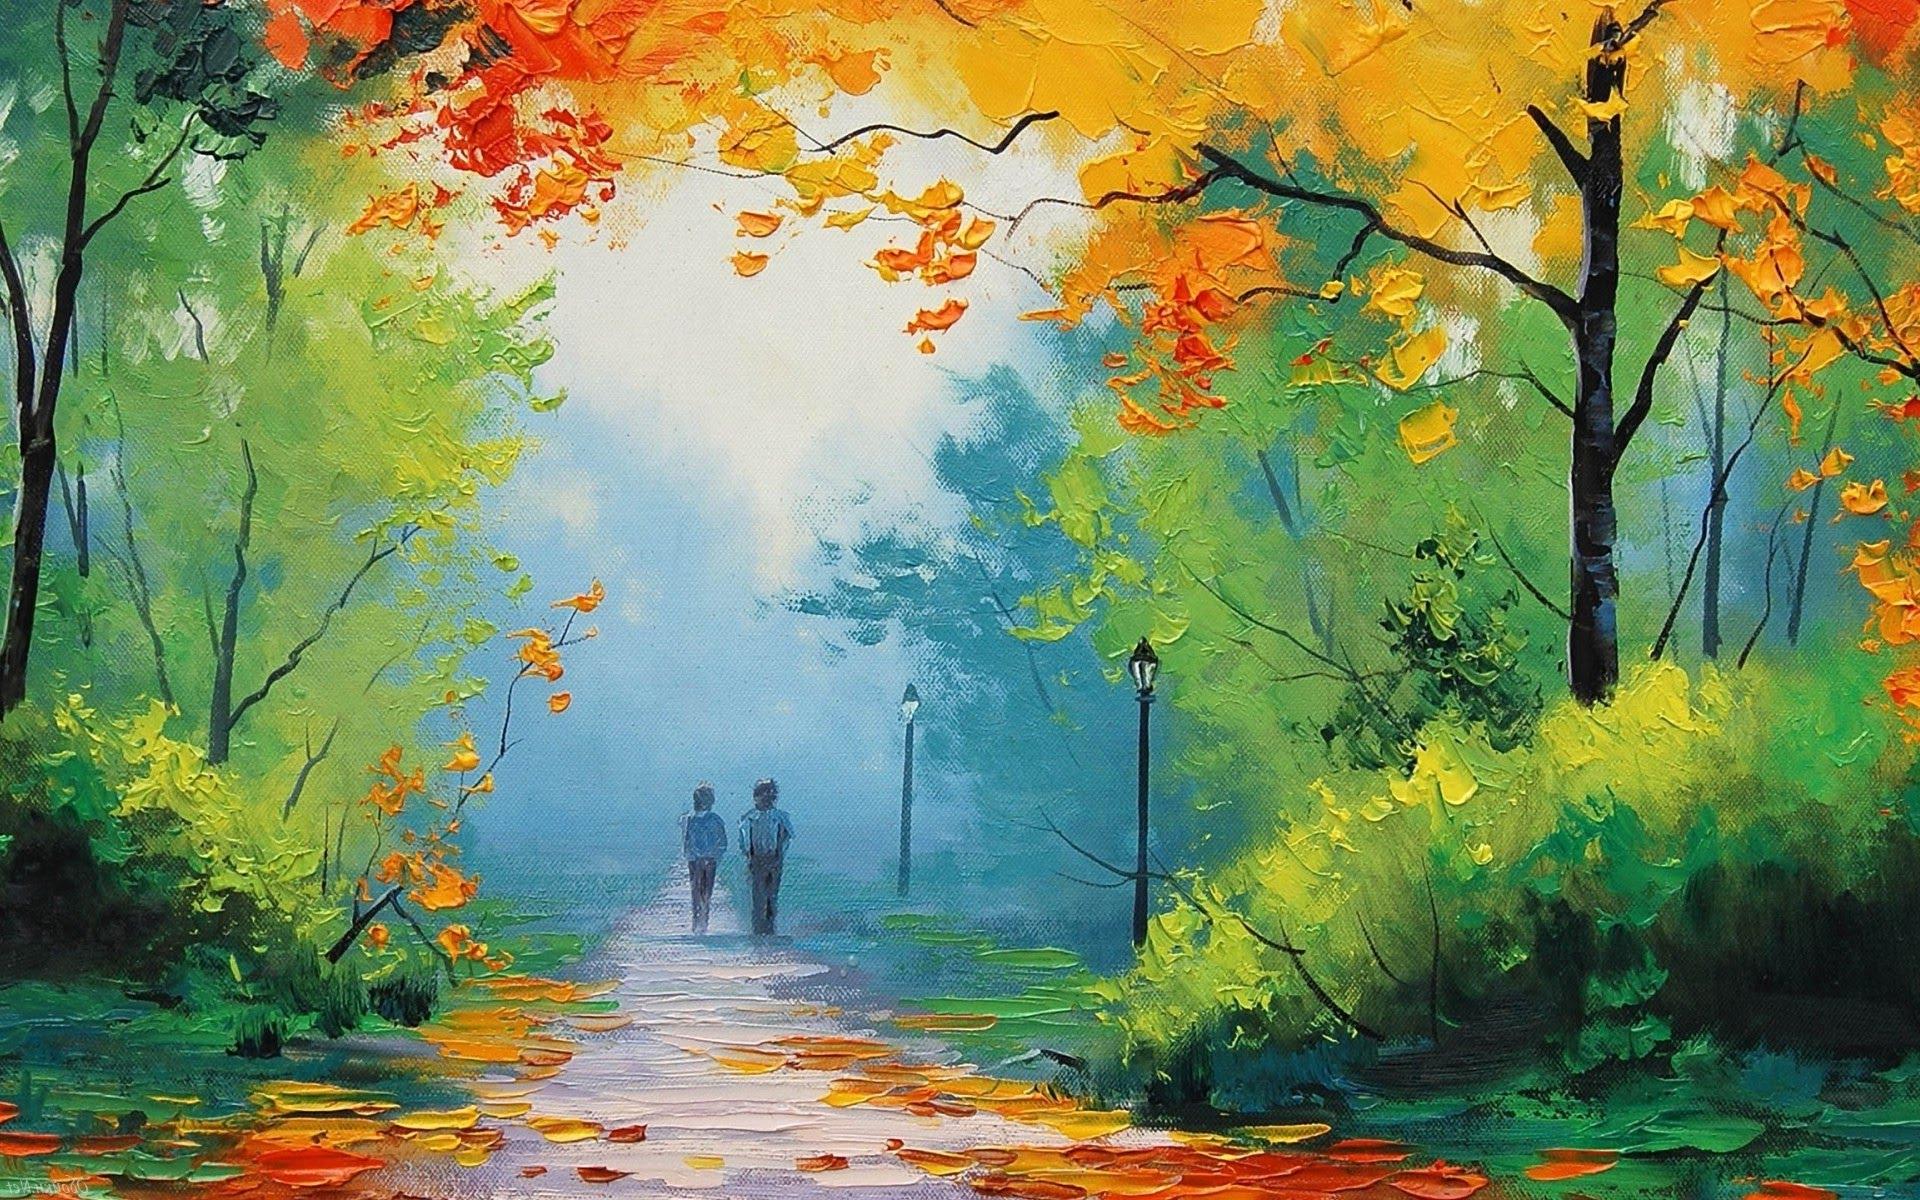 1920x1200 Beautiful Watercolor Paintings Of Nature Most Beautiful Nature